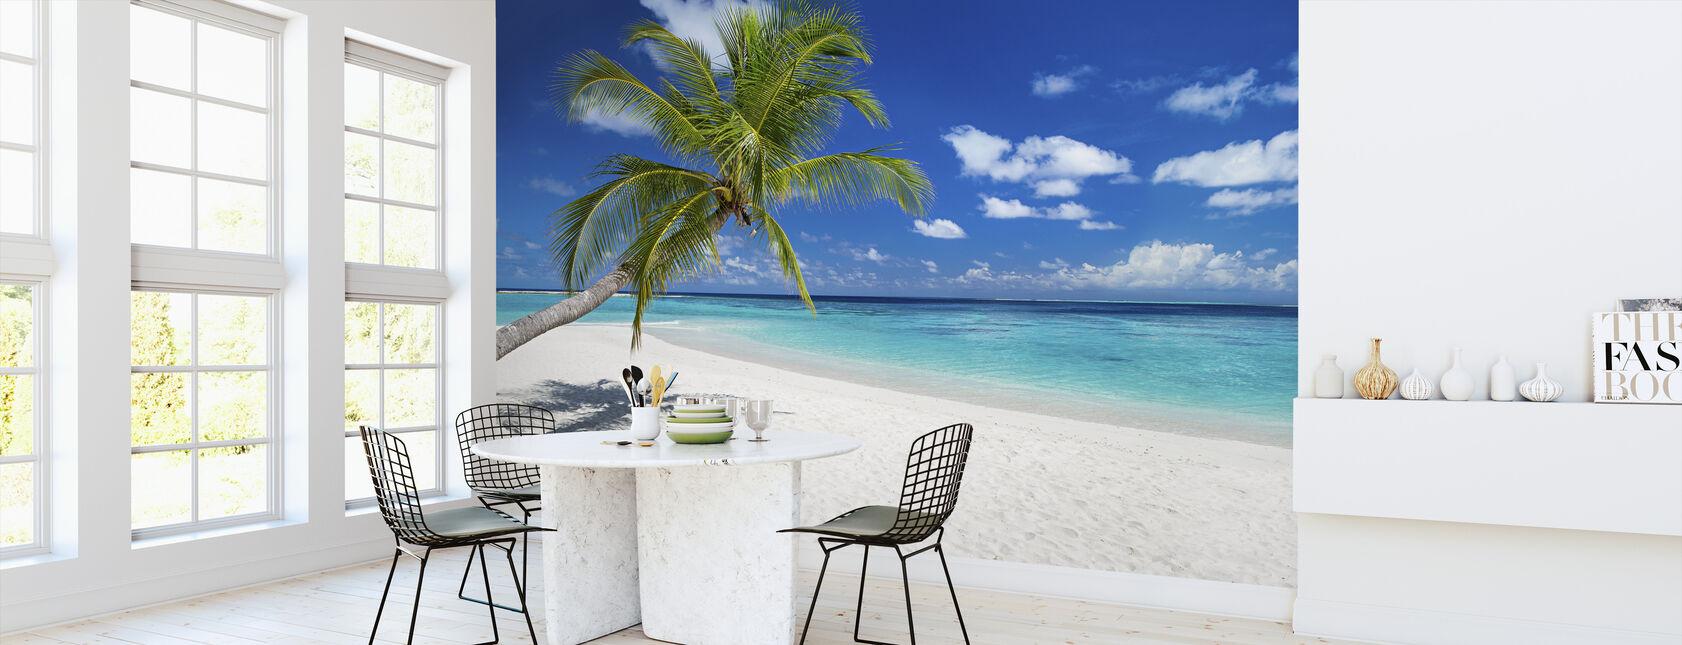 Tropical Beach - Wallpaper - Kitchen